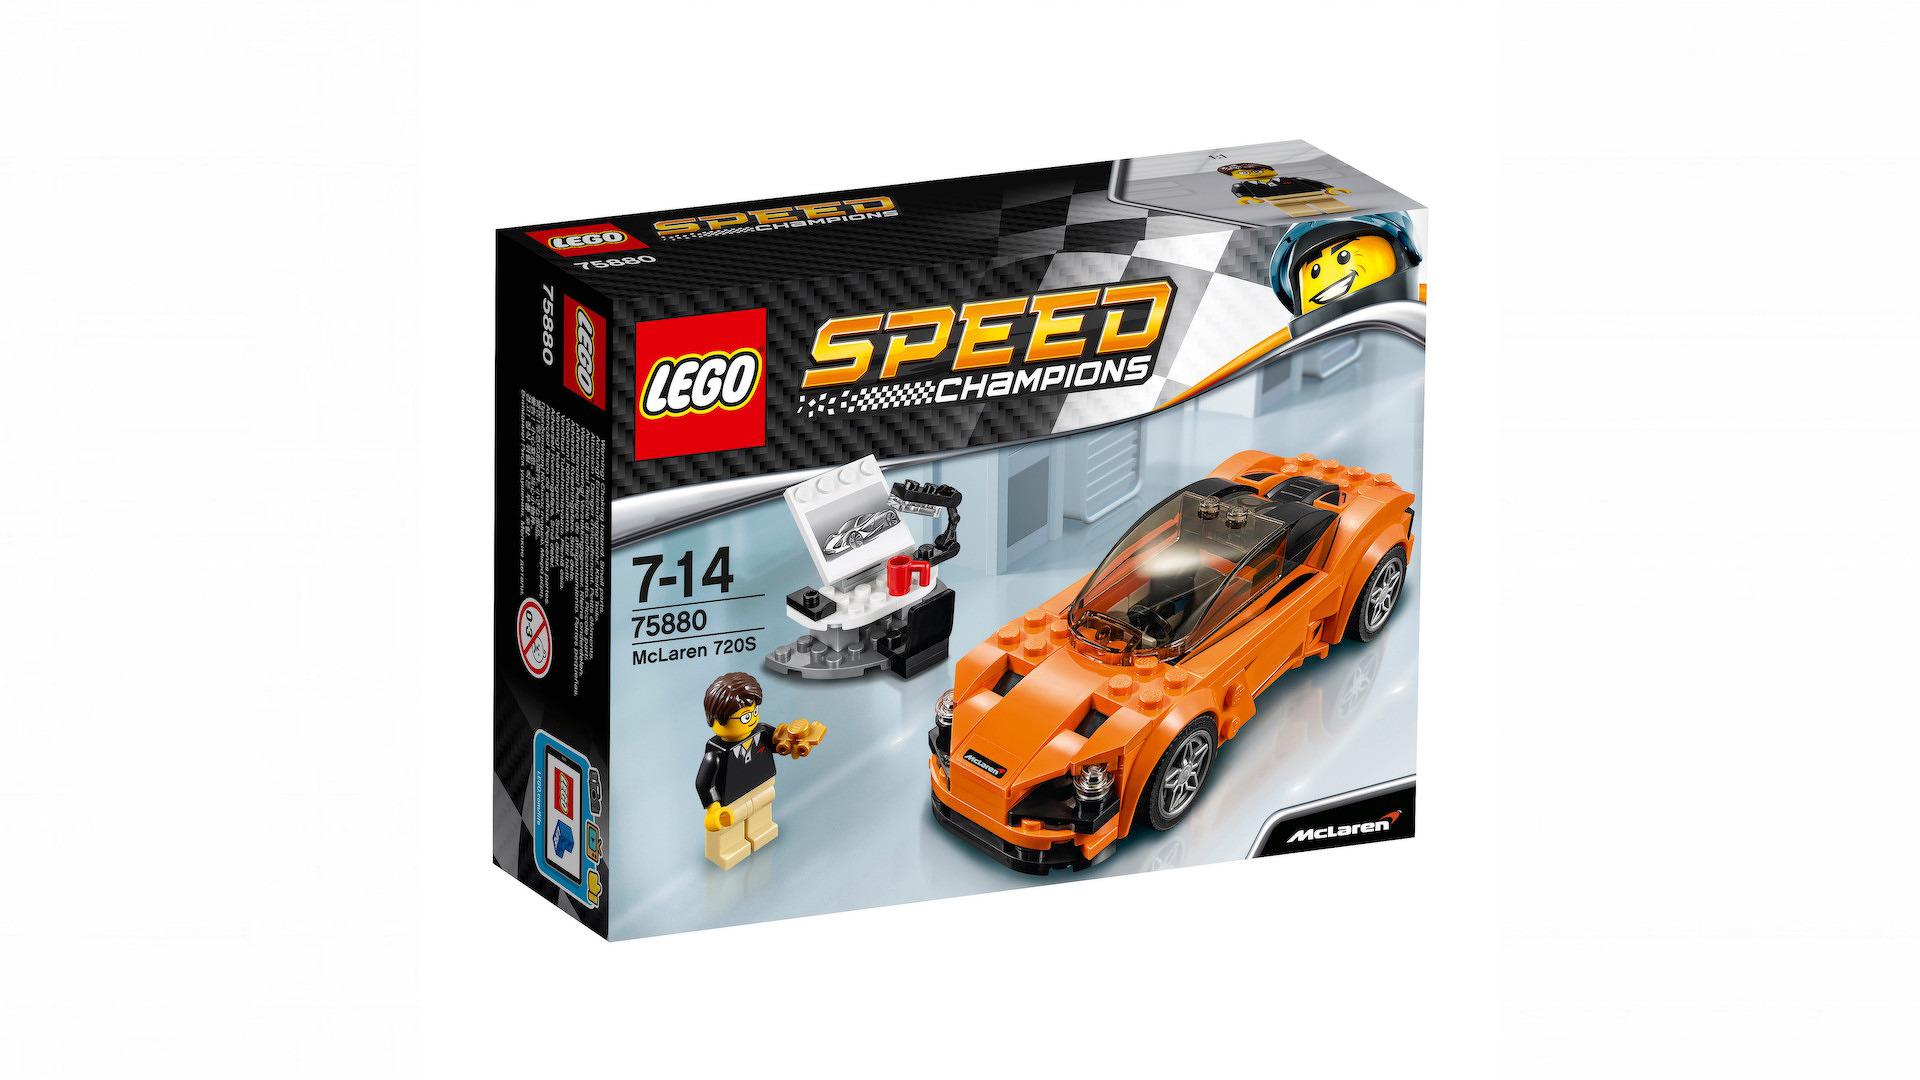 mclaren-720s-lego-speed-champions (3)